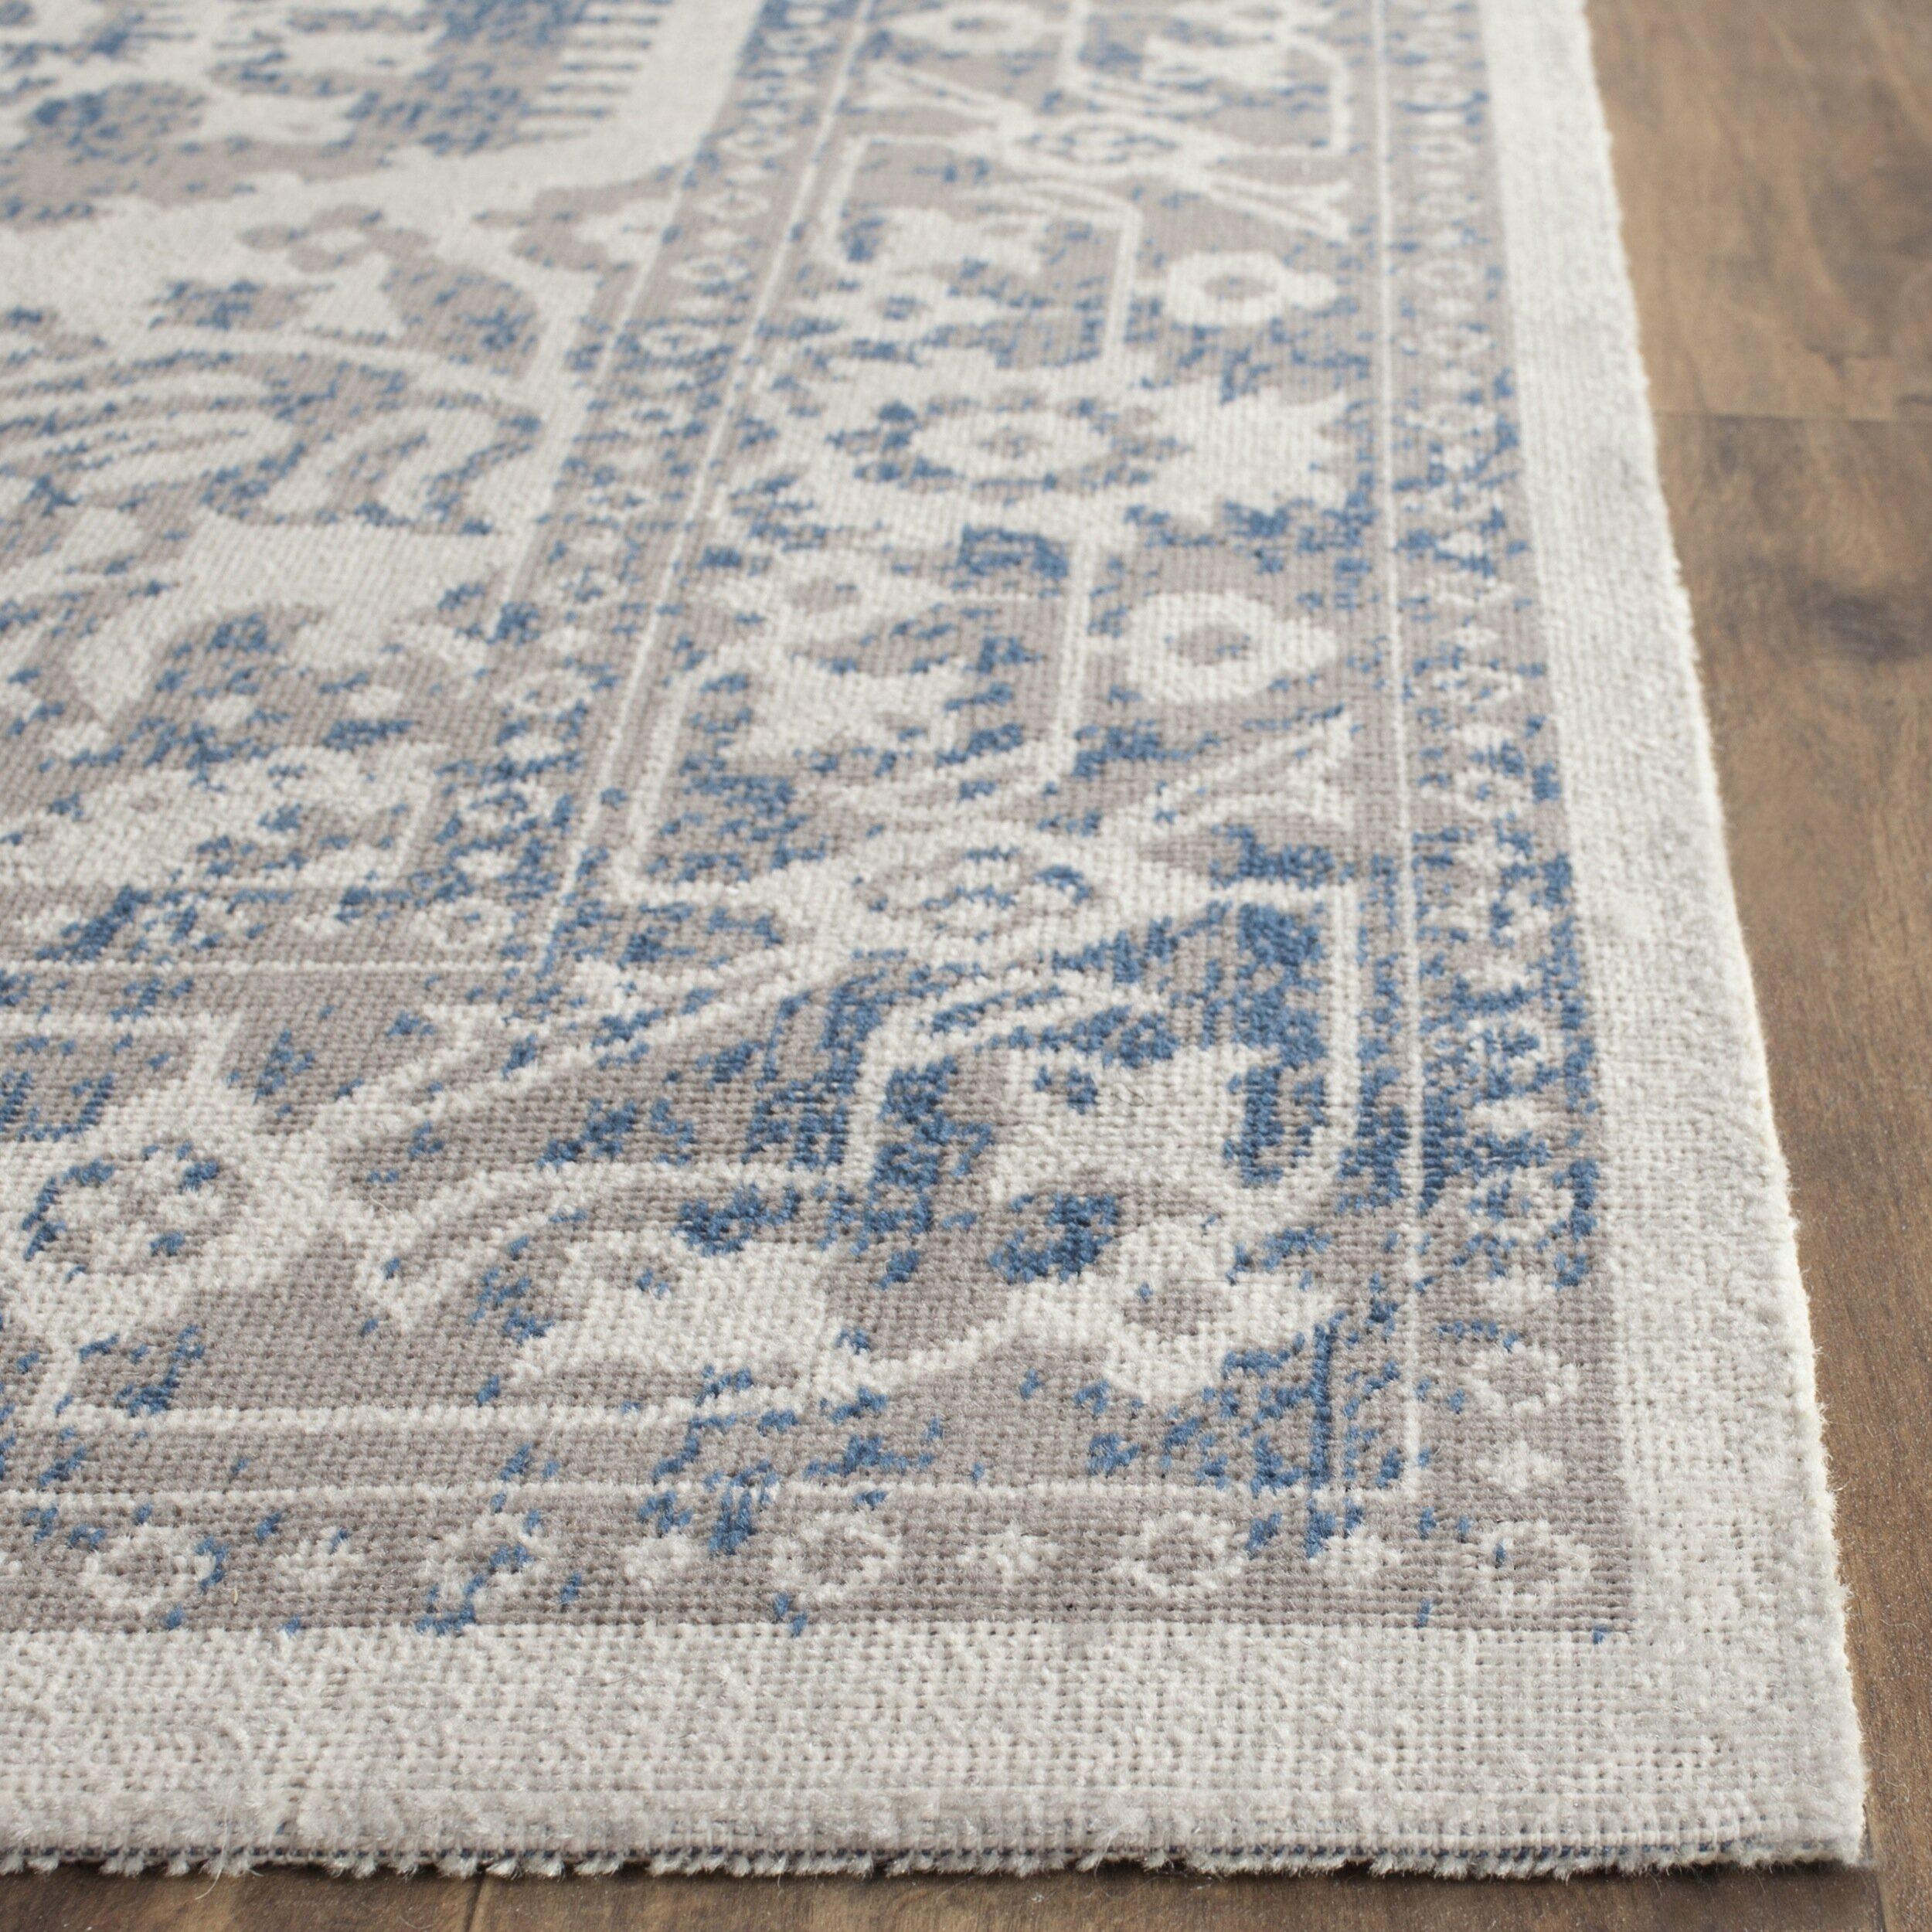 safavieh patina gray blue area rug reviews wayfair. Black Bedroom Furniture Sets. Home Design Ideas